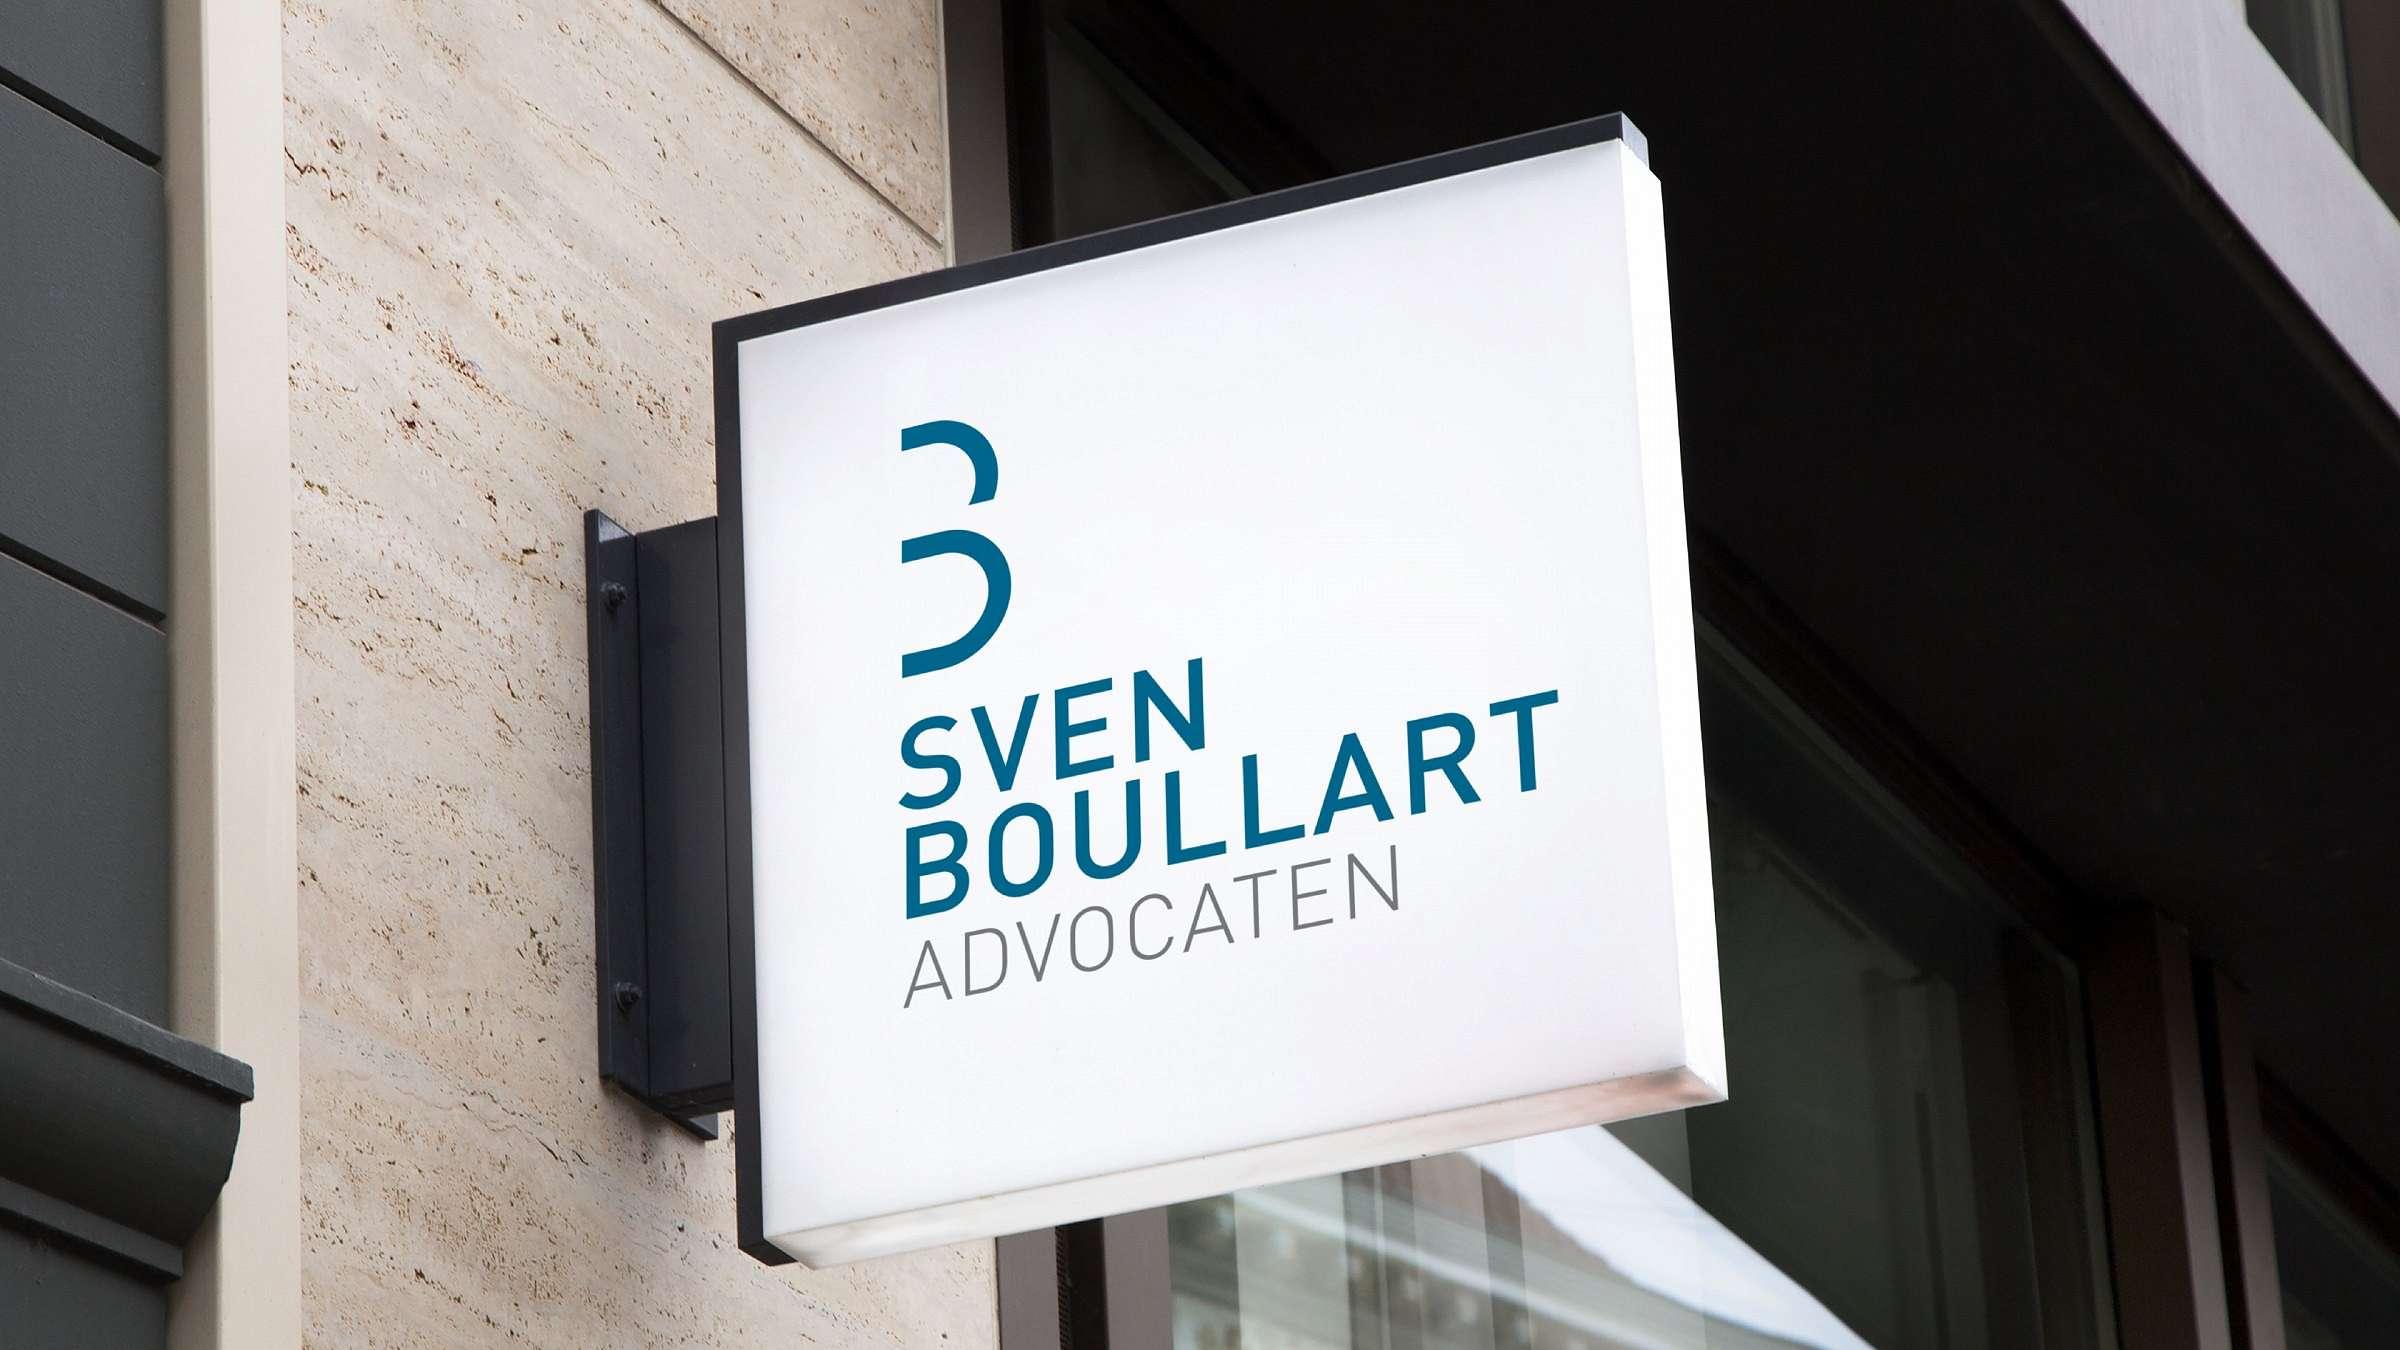 Sven Boullart Advocaten